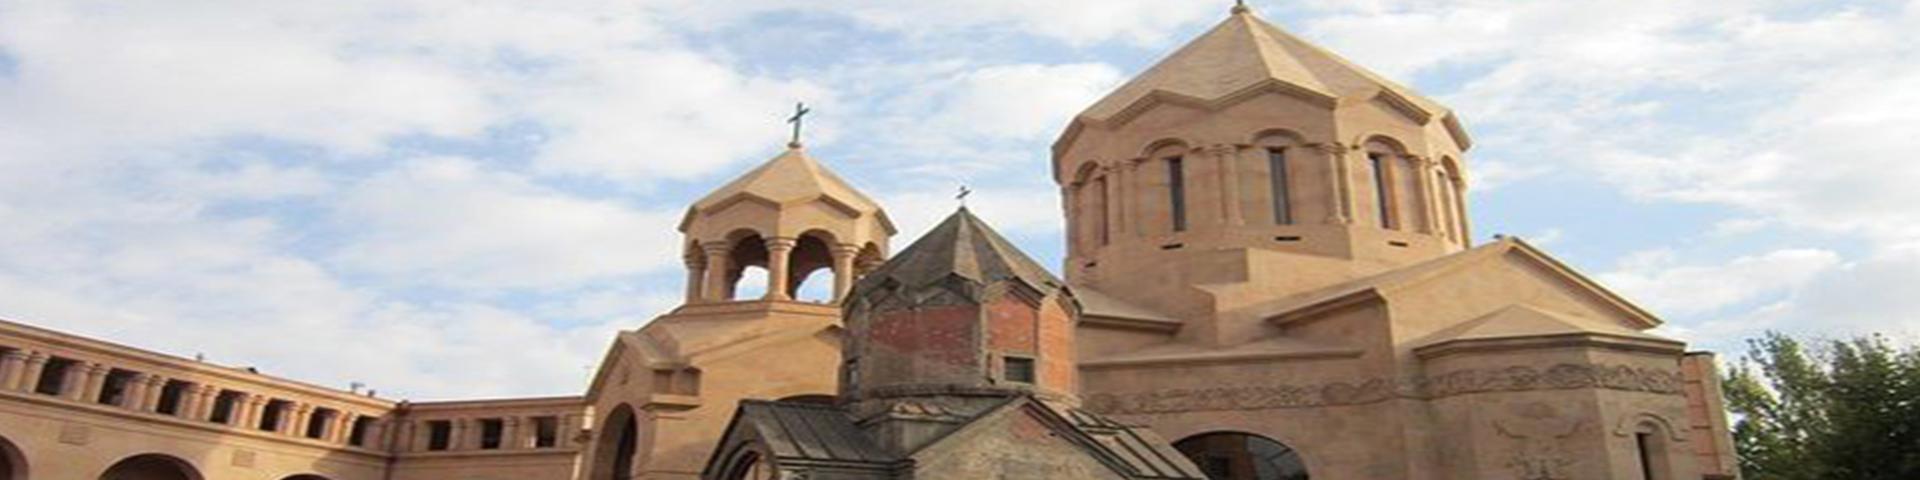 Holy Maryam Catholic Church Yerevan banner